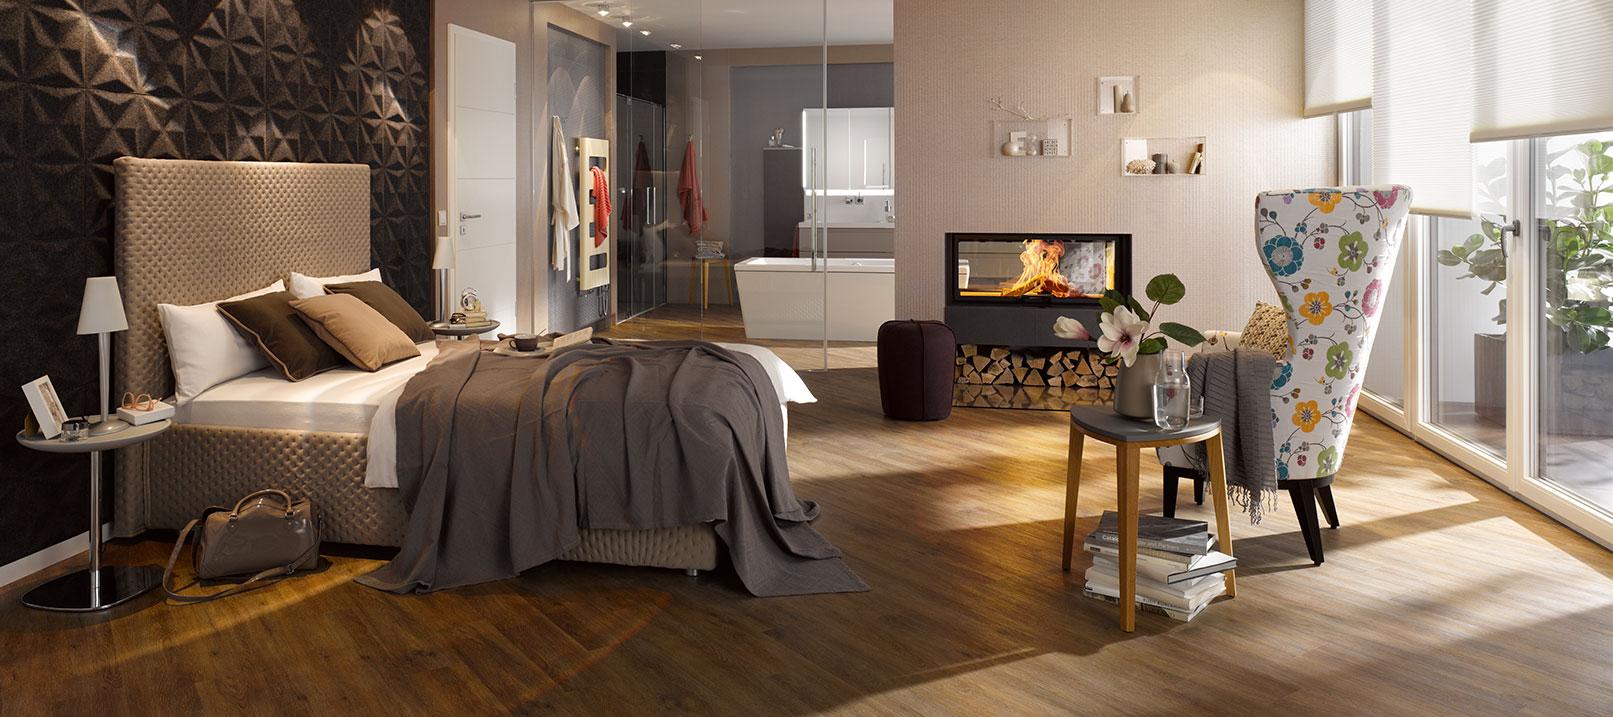 kachel fen und kamine g nstig kaufen ofenoutlet kiel. Black Bedroom Furniture Sets. Home Design Ideas